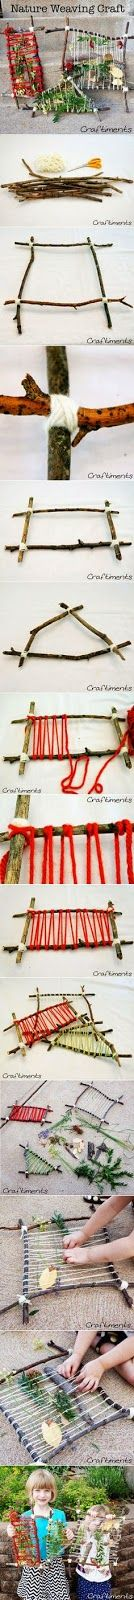 stick, S, tree, T, weave, sew, yarn, Y, string, S